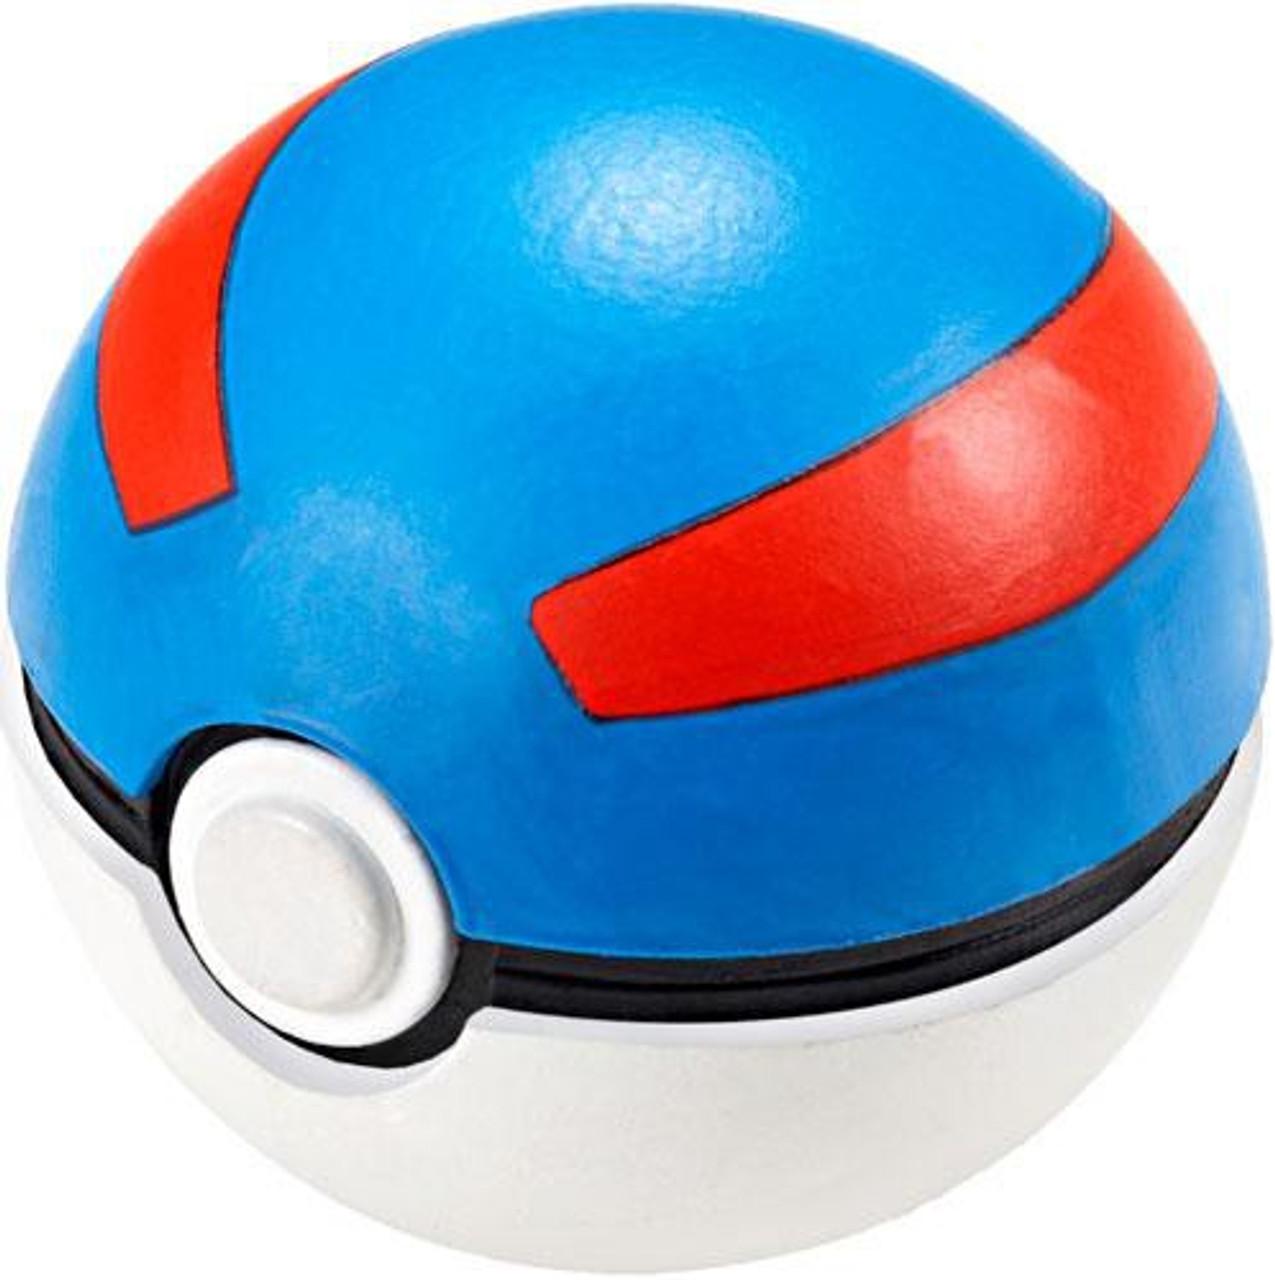 Pokemon Soft Foam 2.5 Inch Pokeball Toy Heal Ball